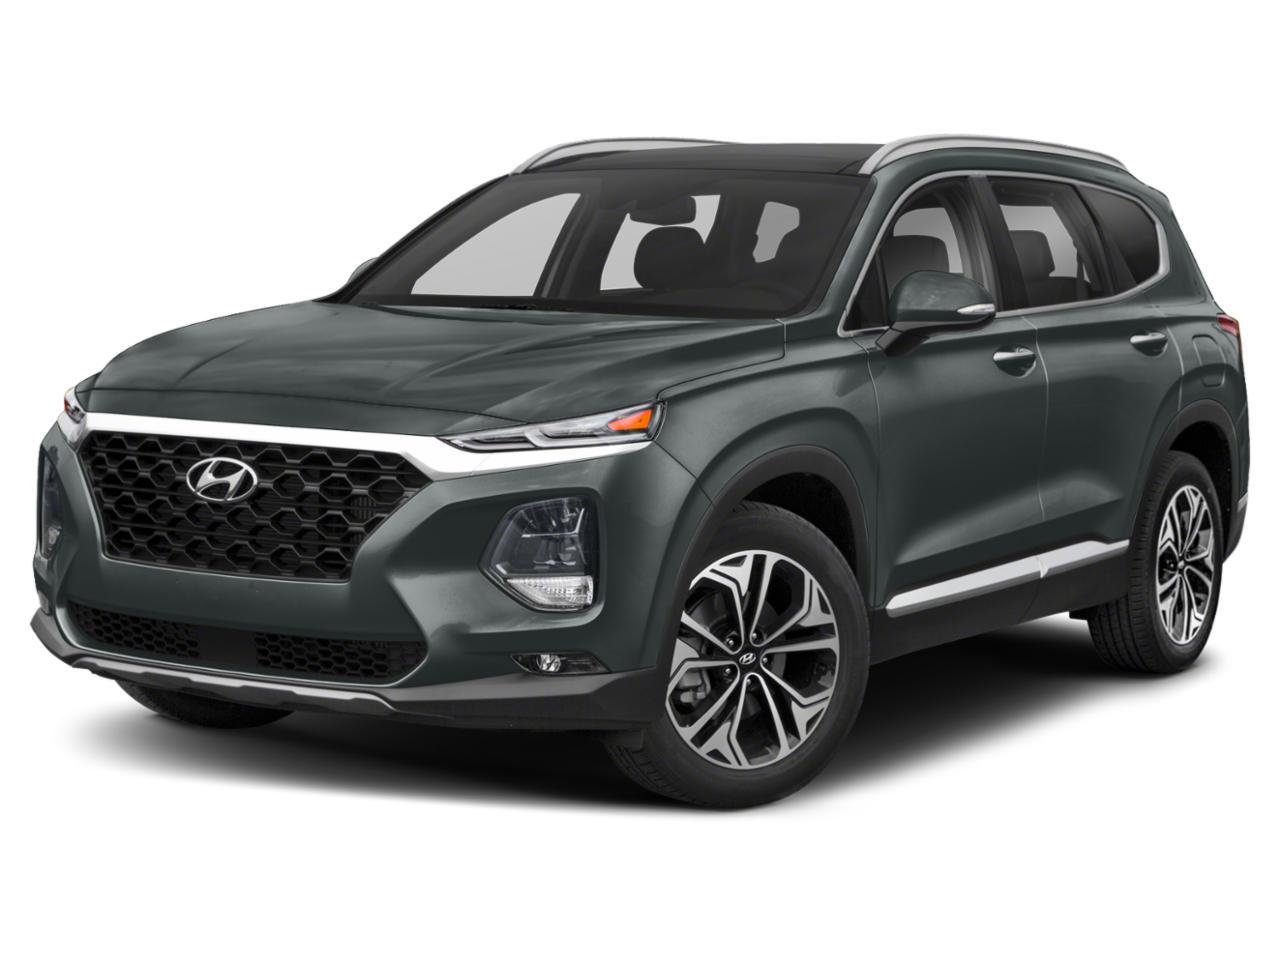 2020 Hyundai Santa Fe Vehicle Photo in Allentown, PA 18103